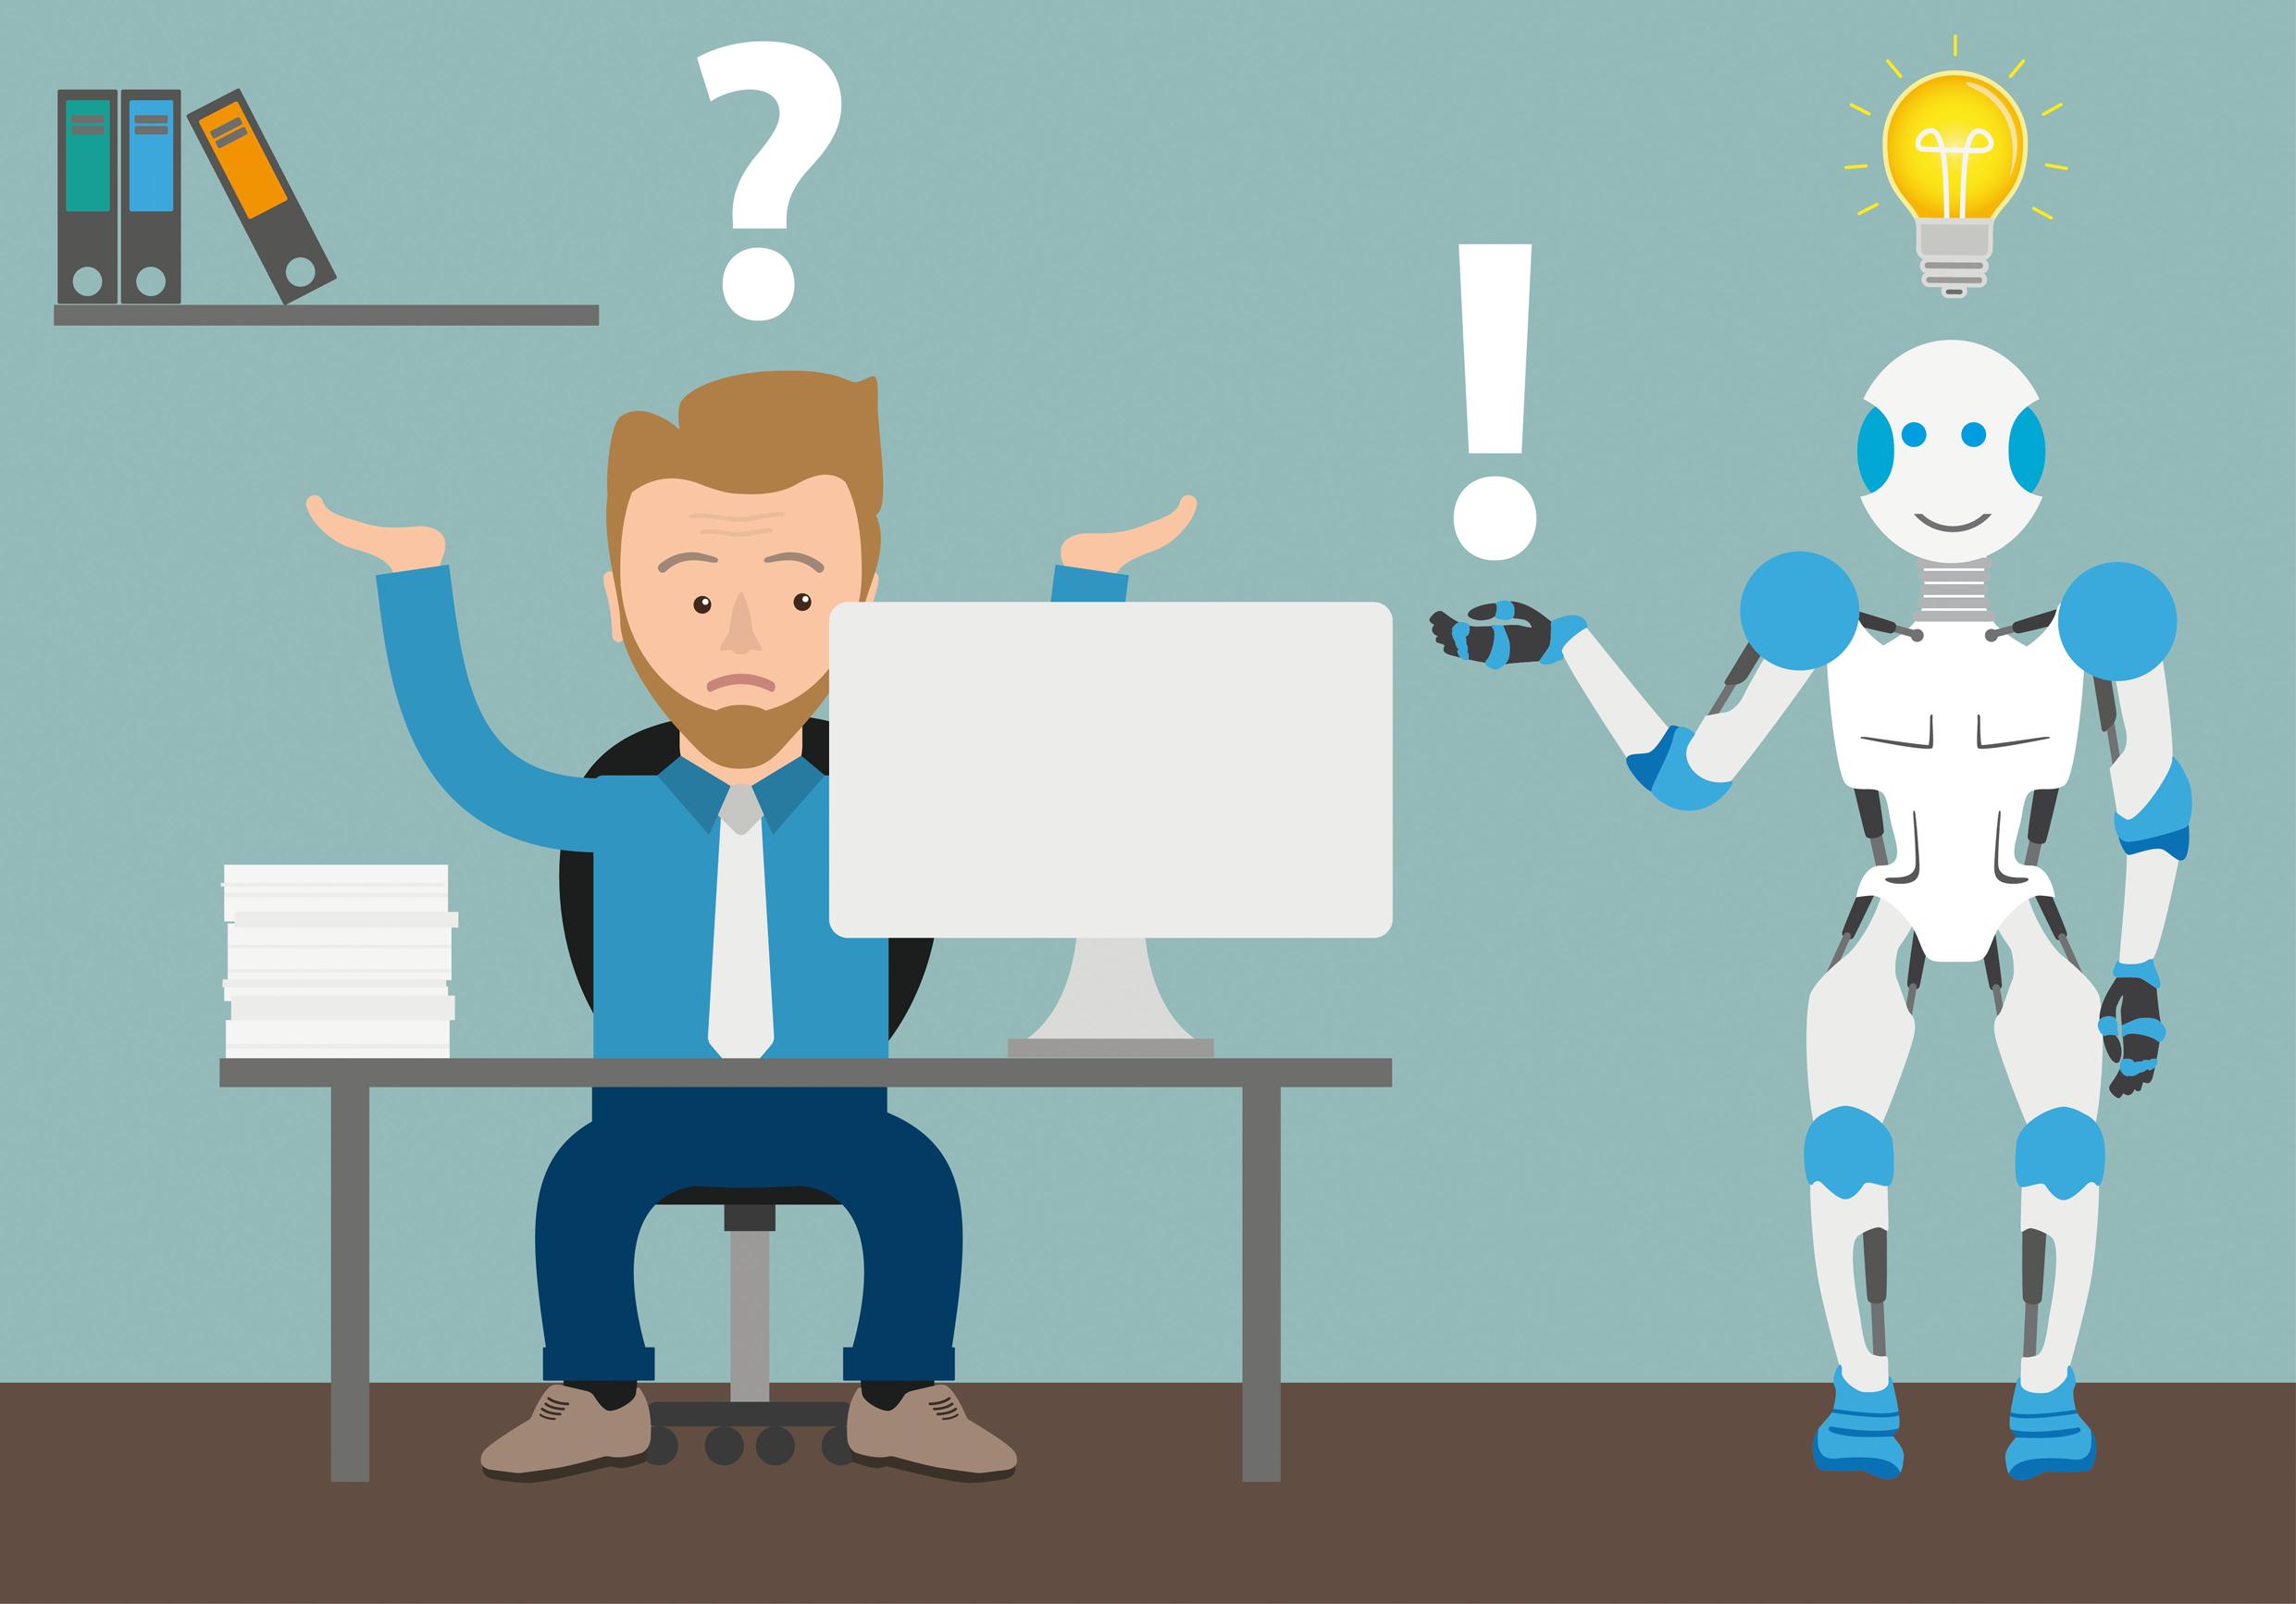 Startups benefit AI